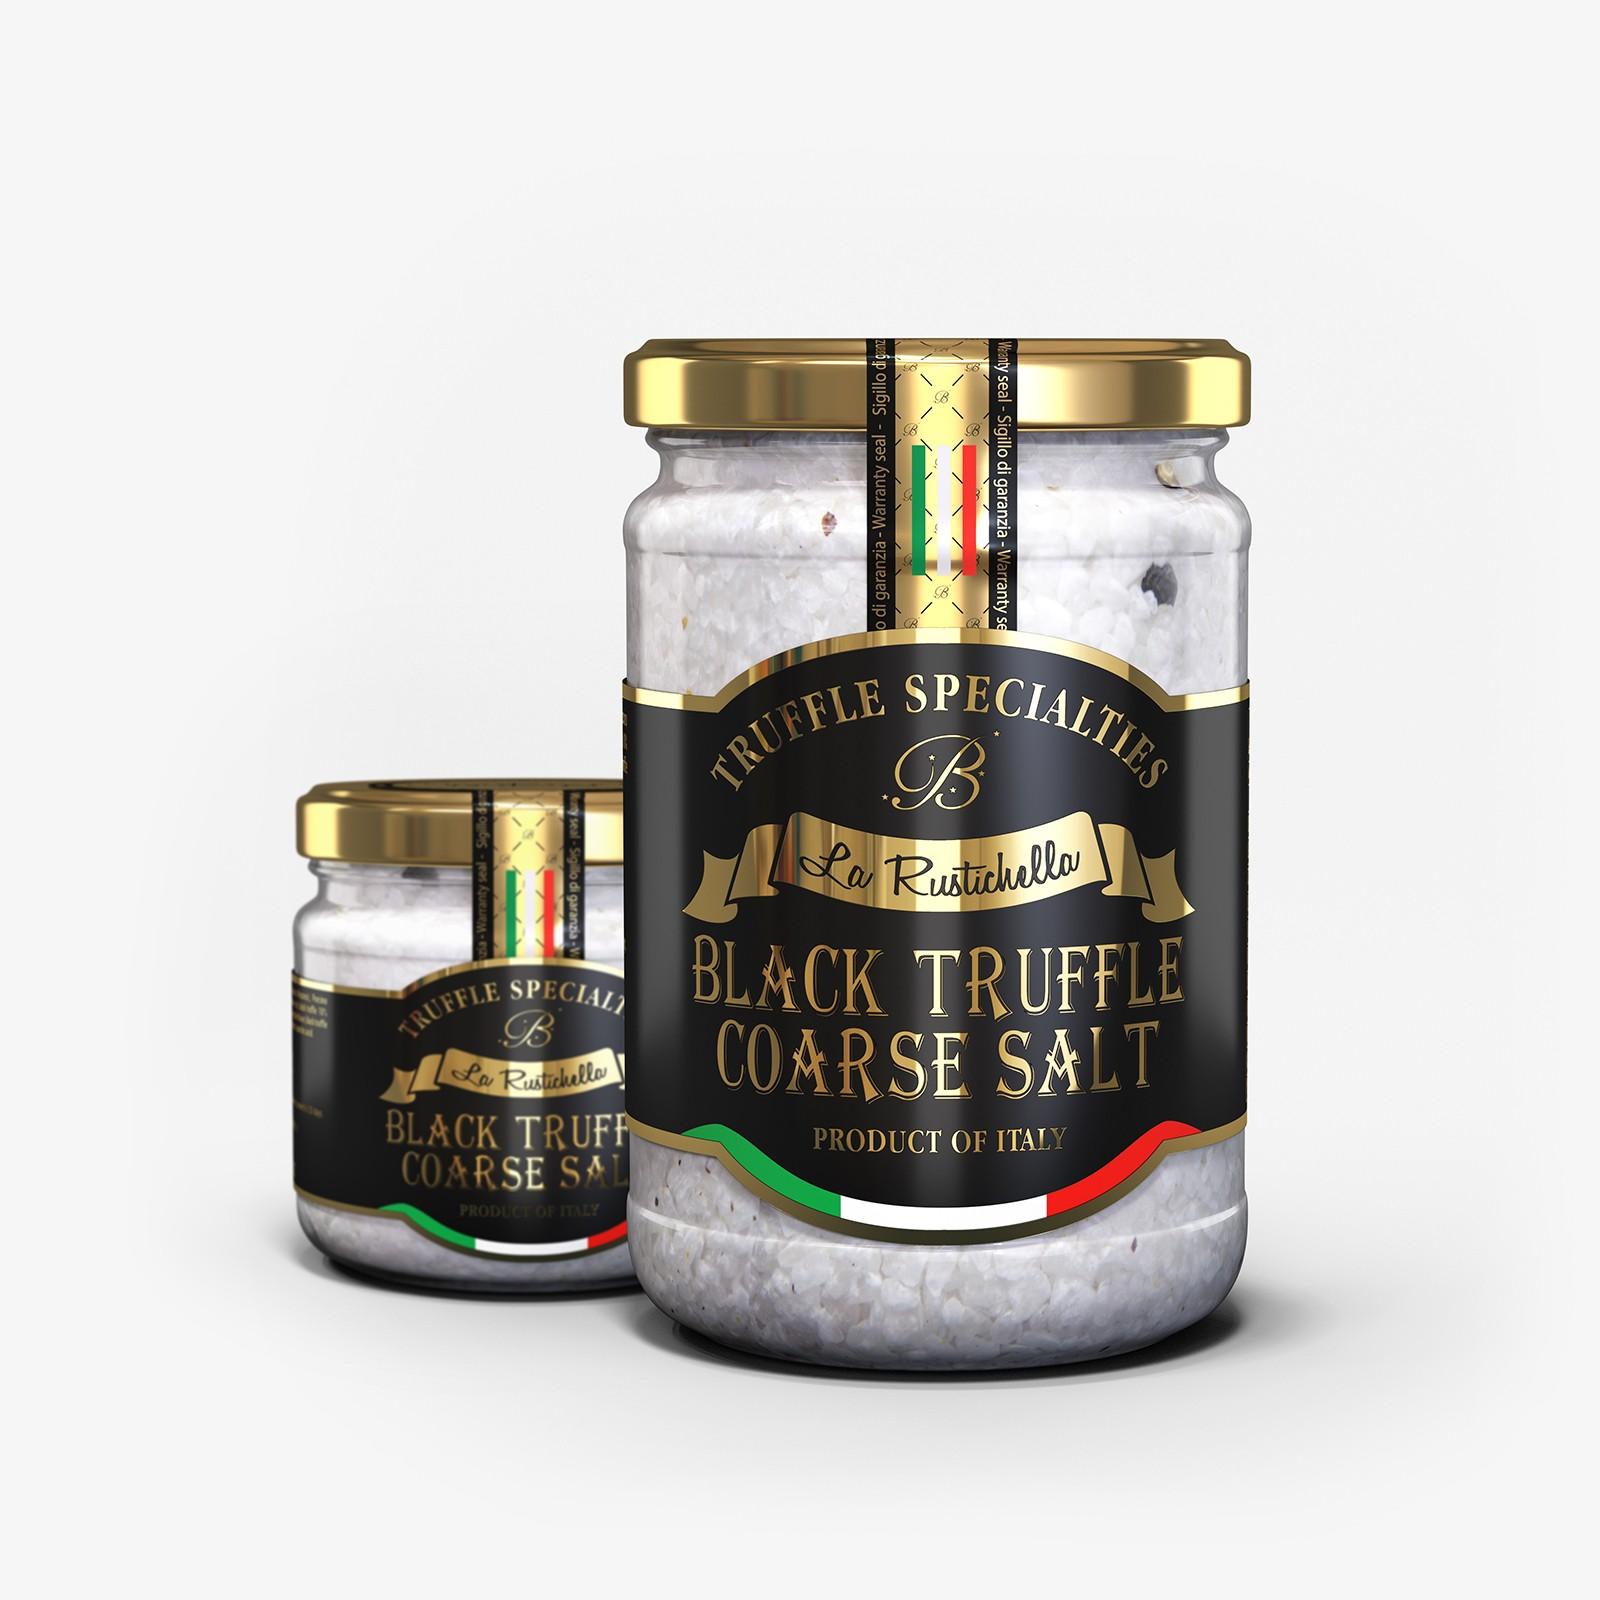 Black truffle coarse salt